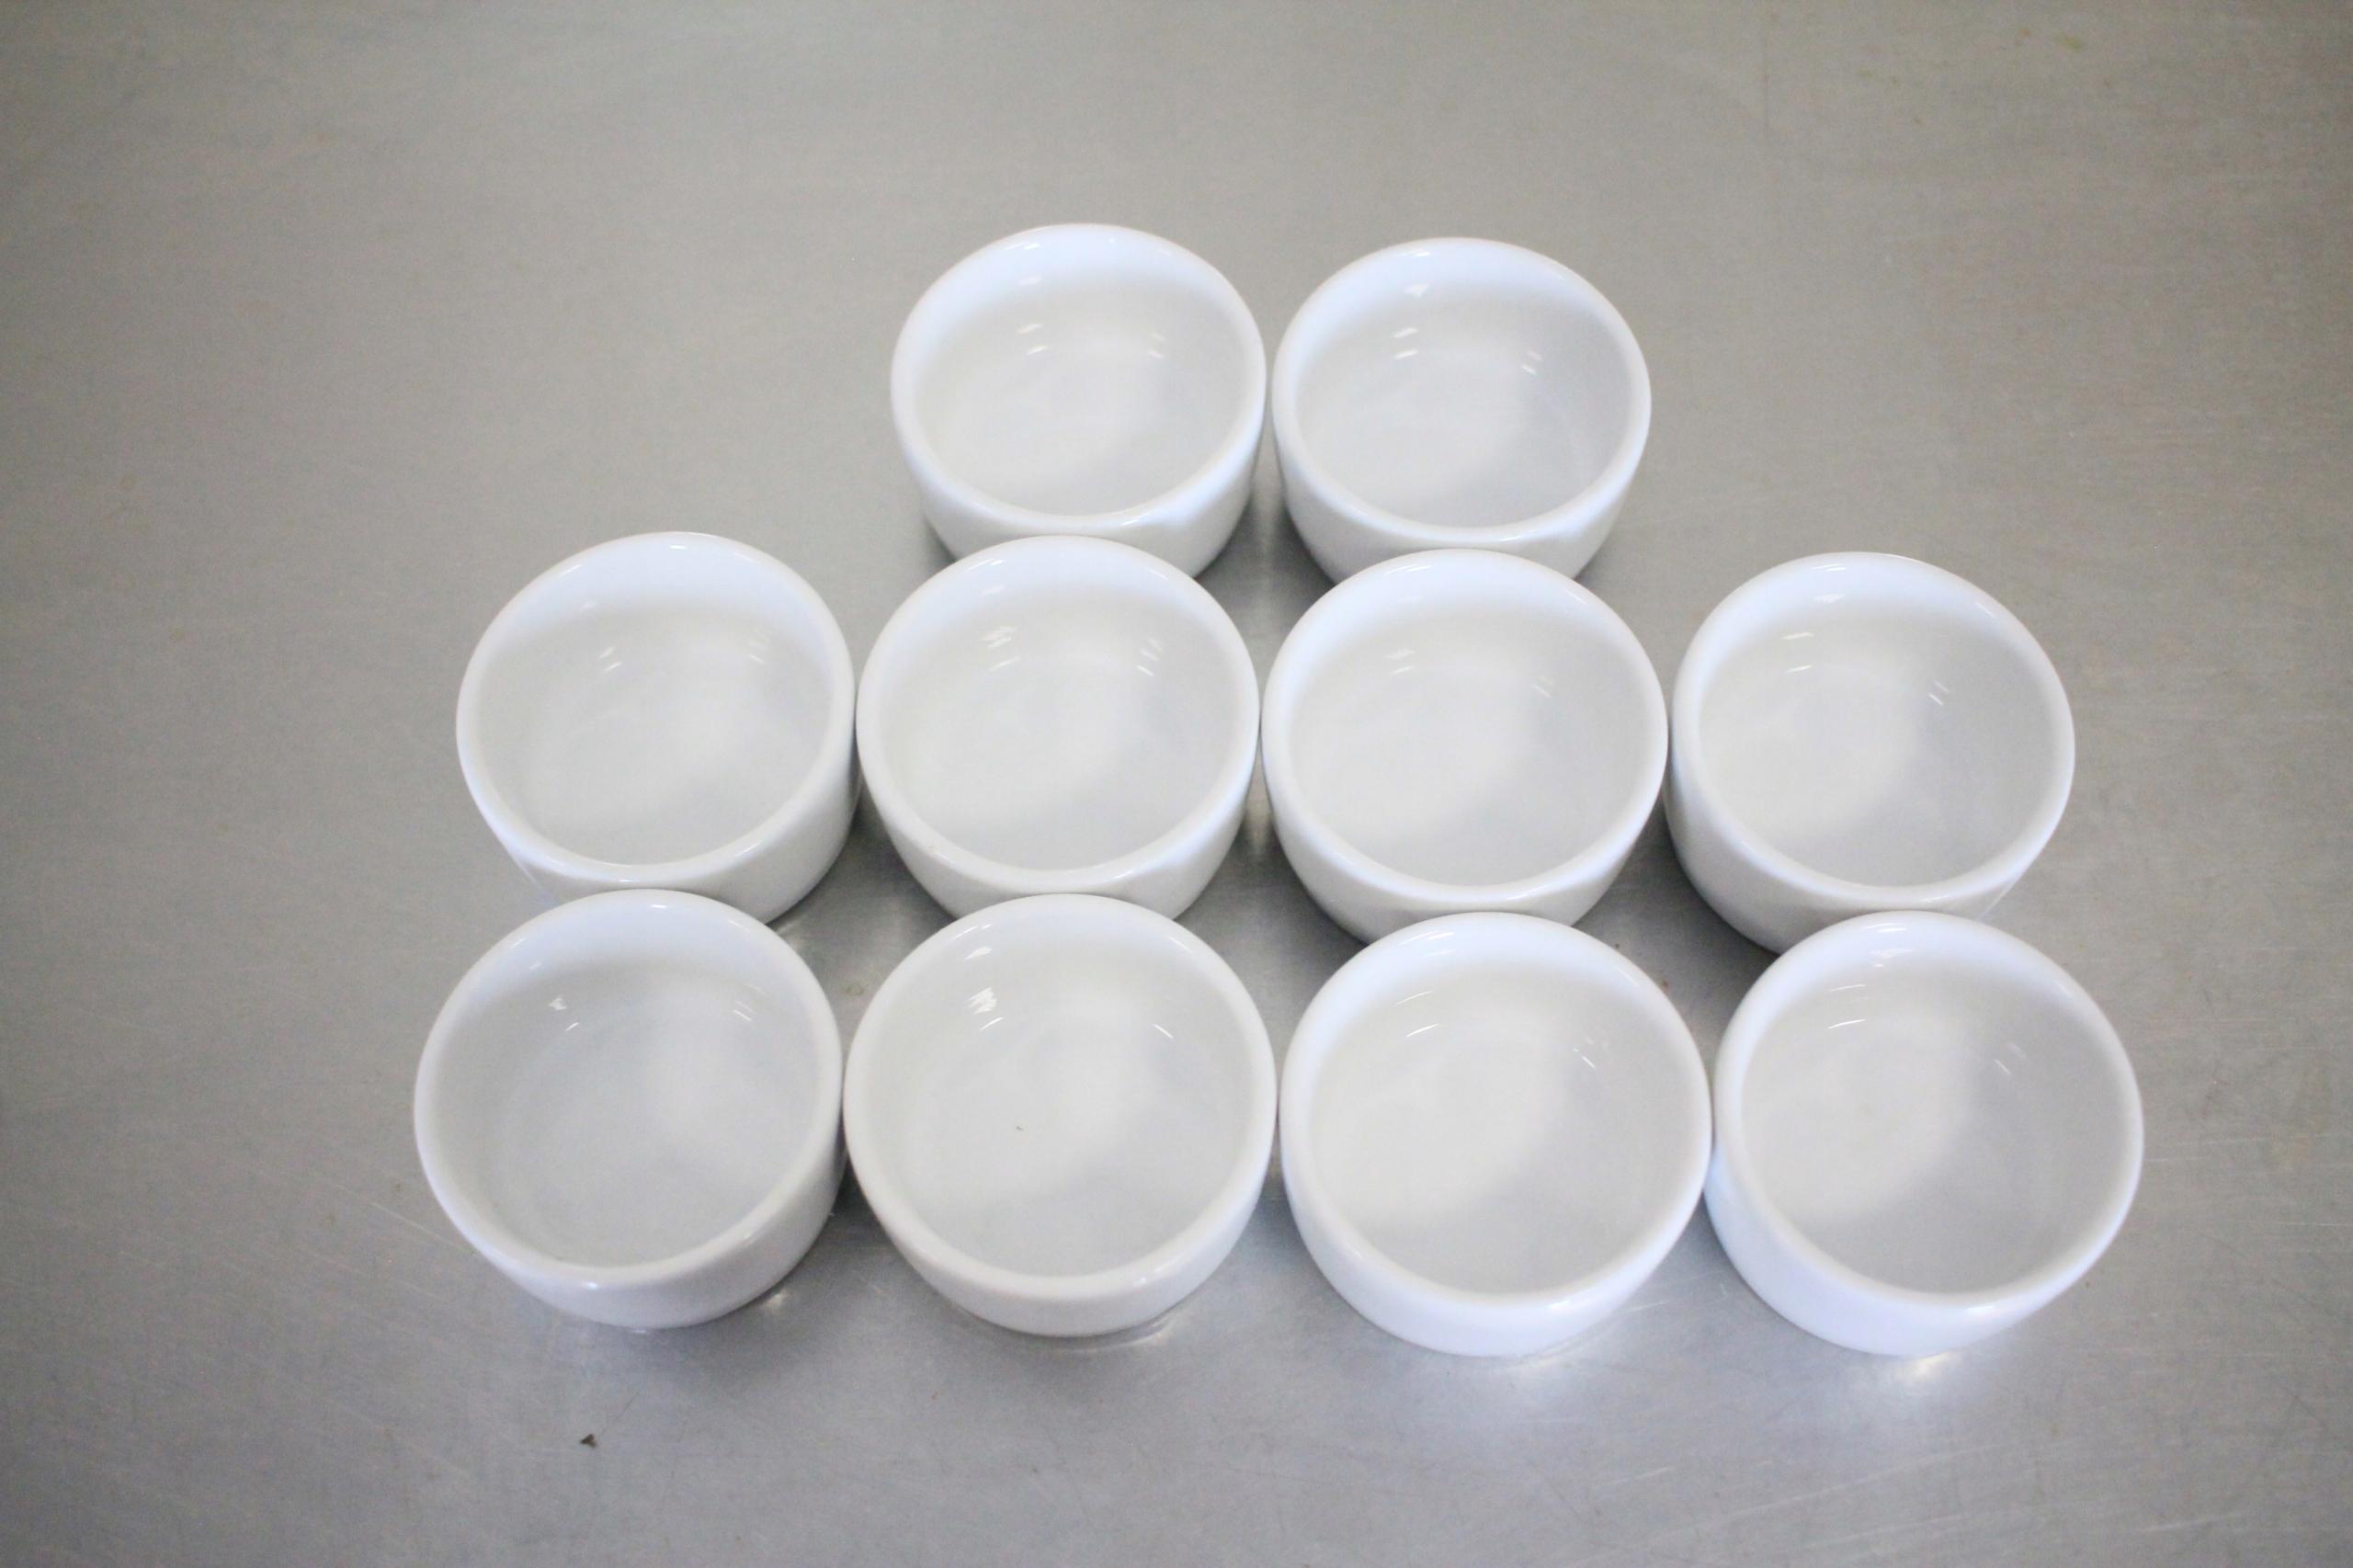 Sosjerki porcelanowe Lubiana - 10 sztuk